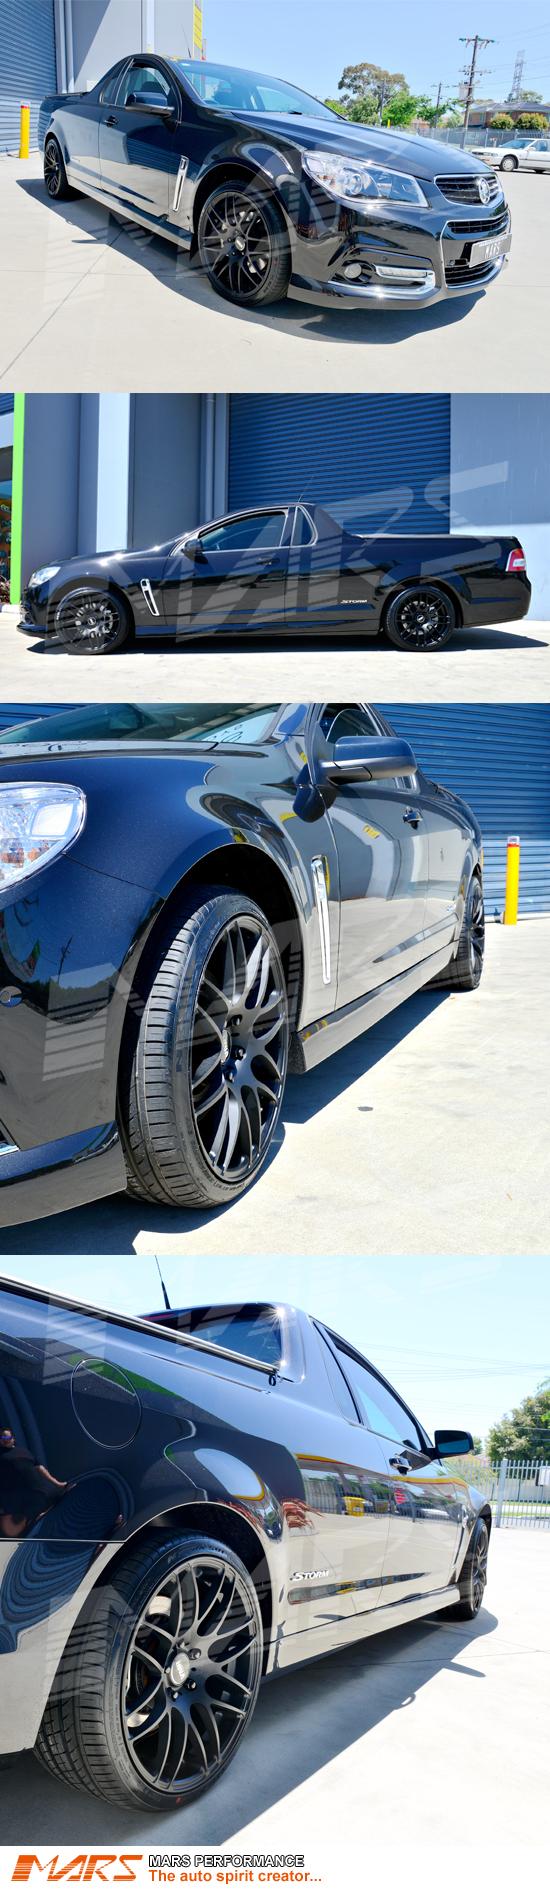 Vmr V718 19 Quot Black Stag Concave Alloy Wheels Rims 5x120